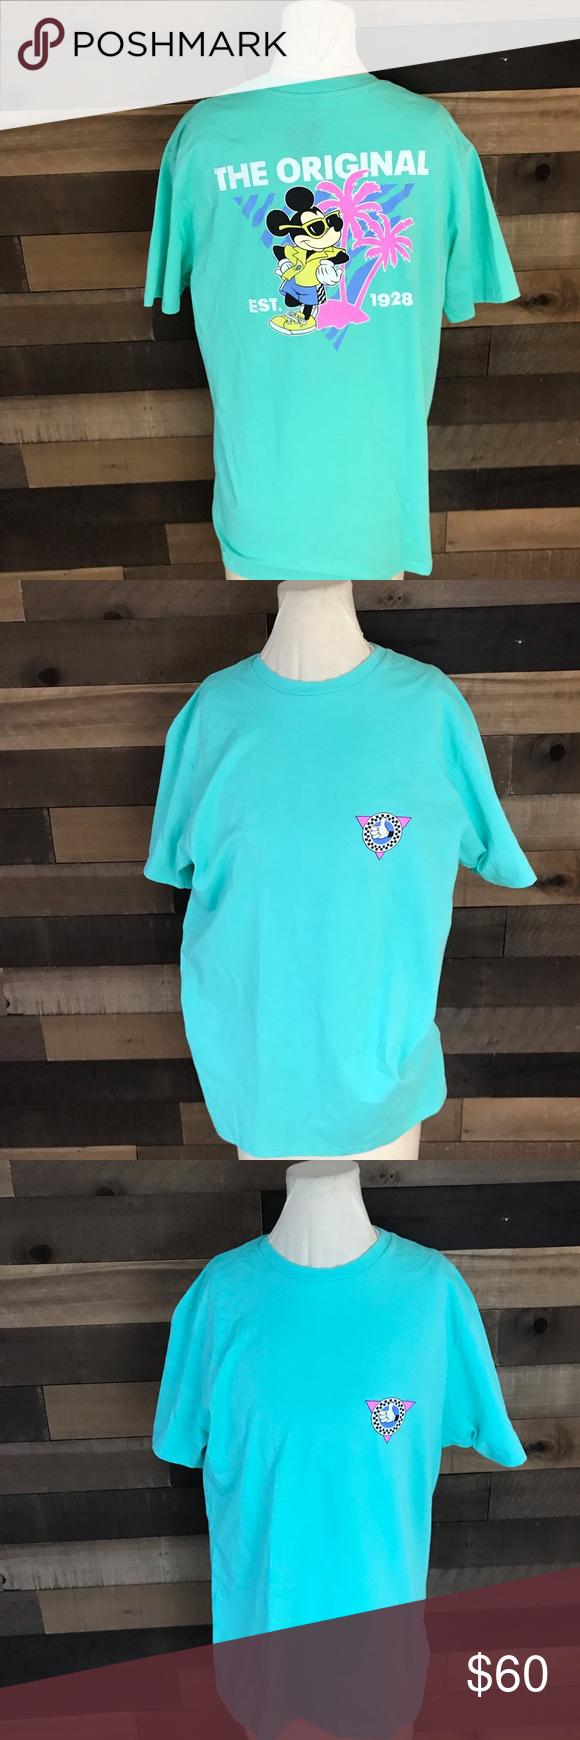 4fb0f9cab0 Disney Mickey vans teal shirt men s medium rare Vans x Disney Men s 90th  Anniversary Mickey Mouse T-Shirt Color  Teal   Bermuda Men s Medium Rare  shirt new ...